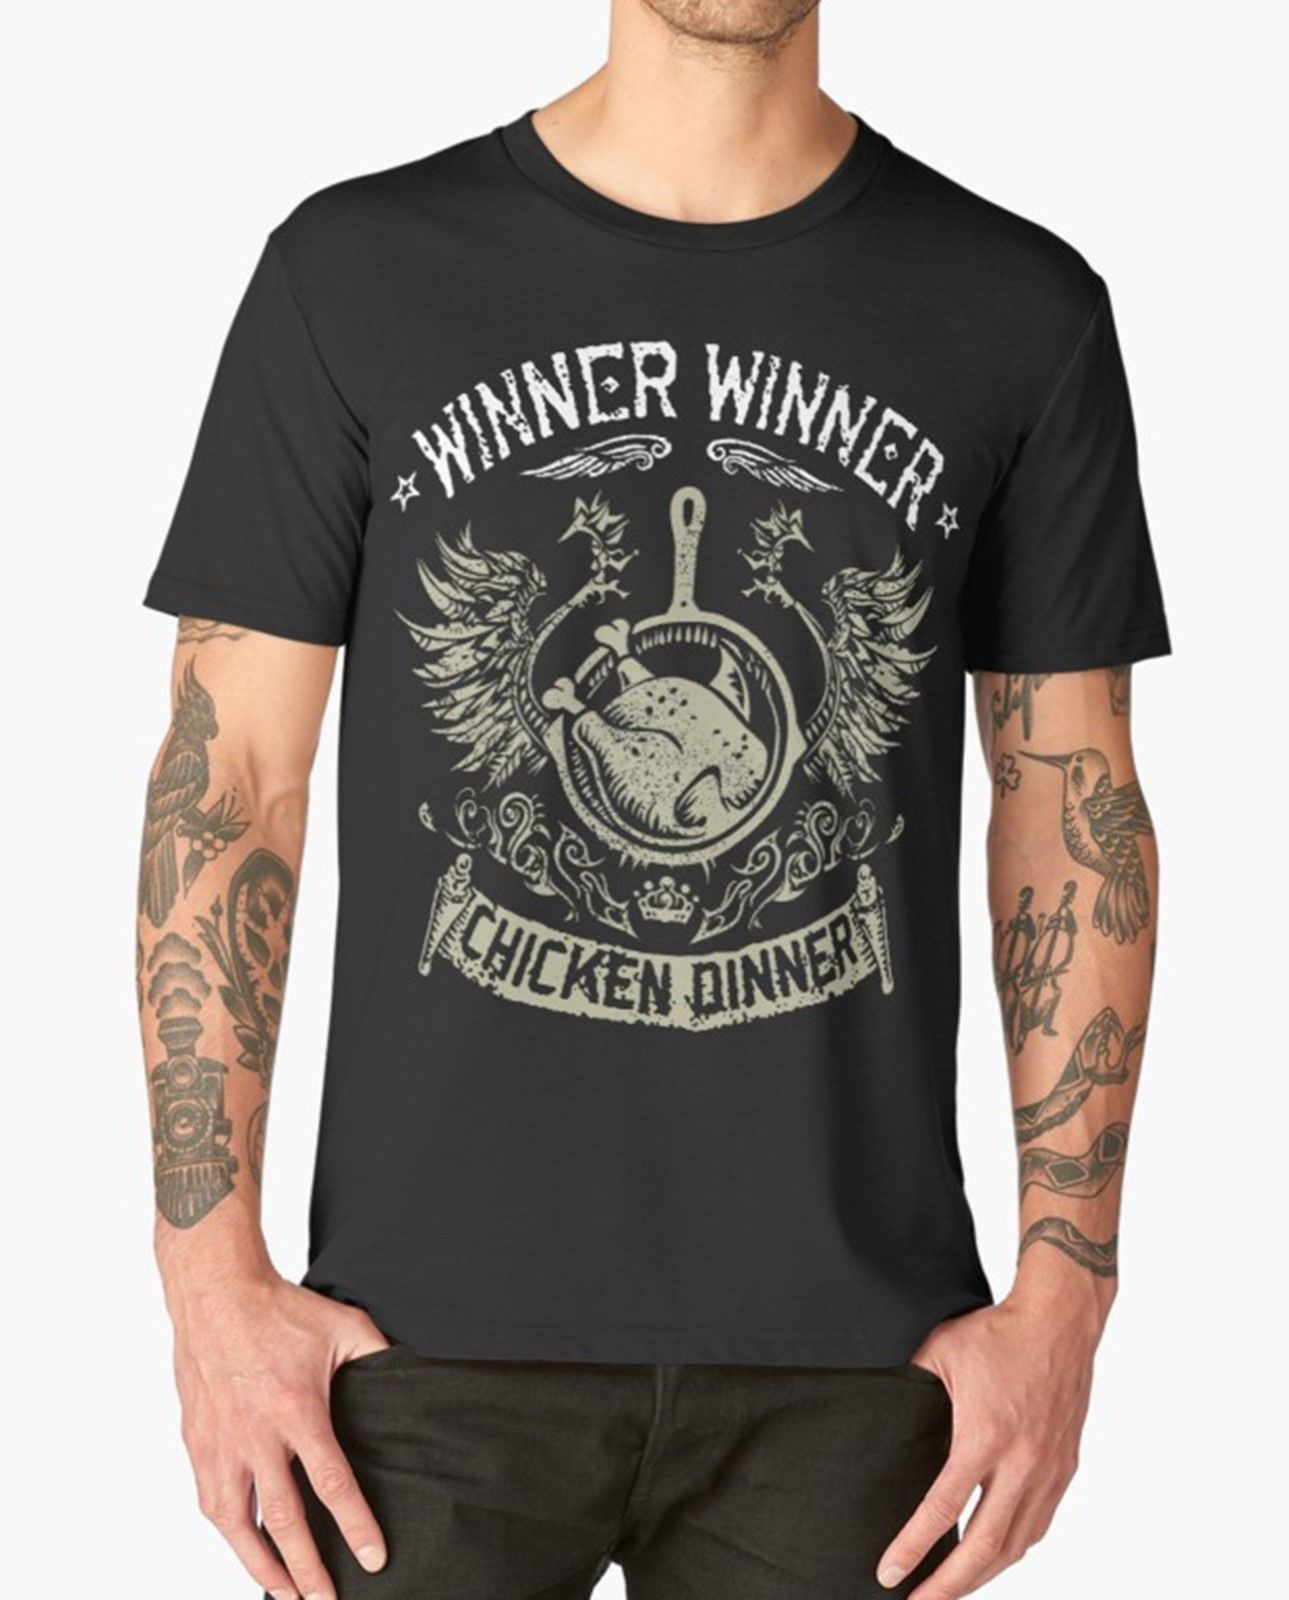 WINNER WINNER CHICKEN DINNER T SHIRT YES WE PAN GAMER GAME PS4 XBOX PUBG